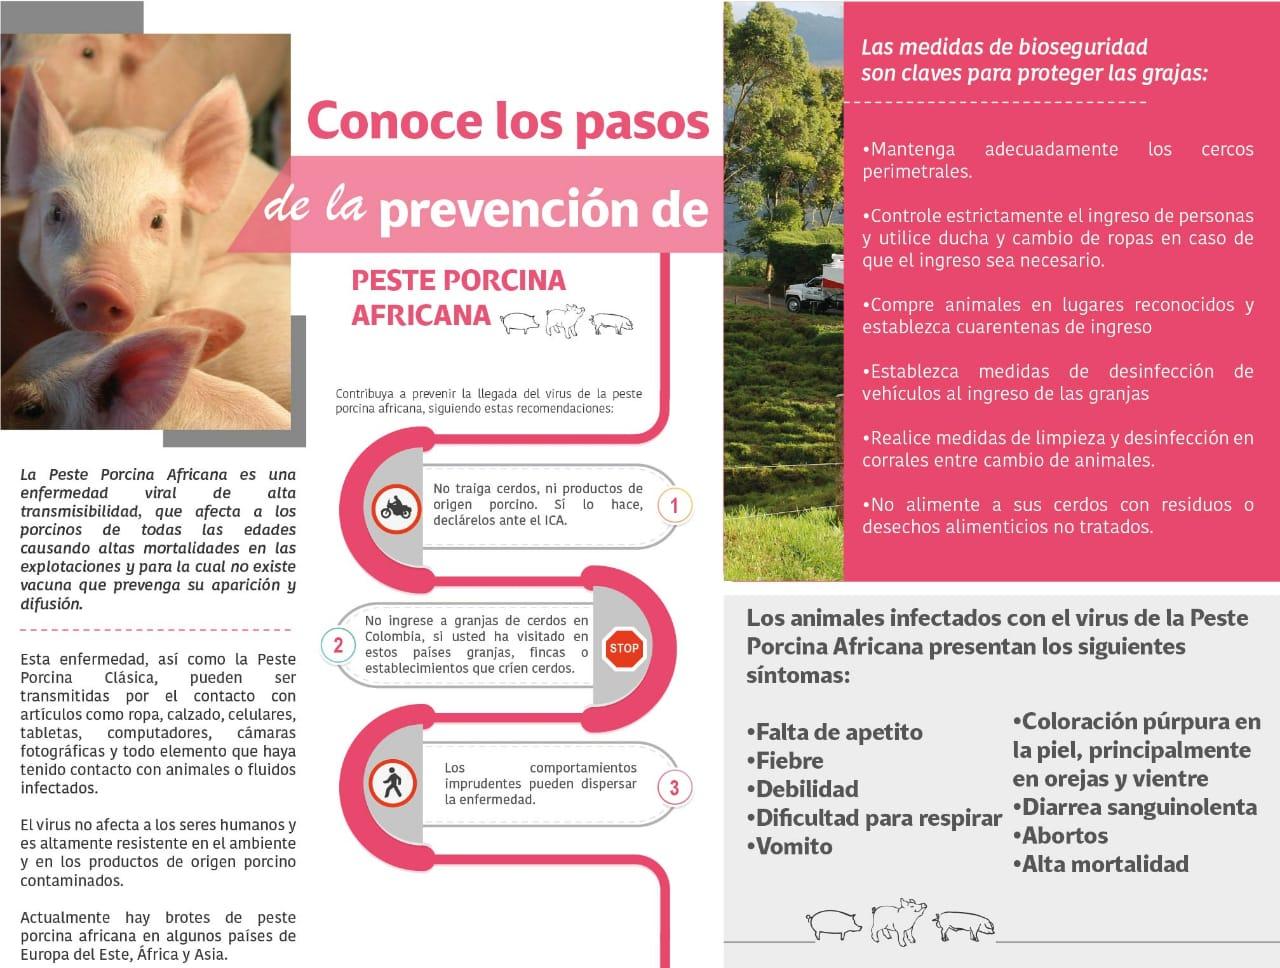 https://www.porkcolombia.co/wp-content/uploads/2019/05/peste-porcina-africana-img.jpg